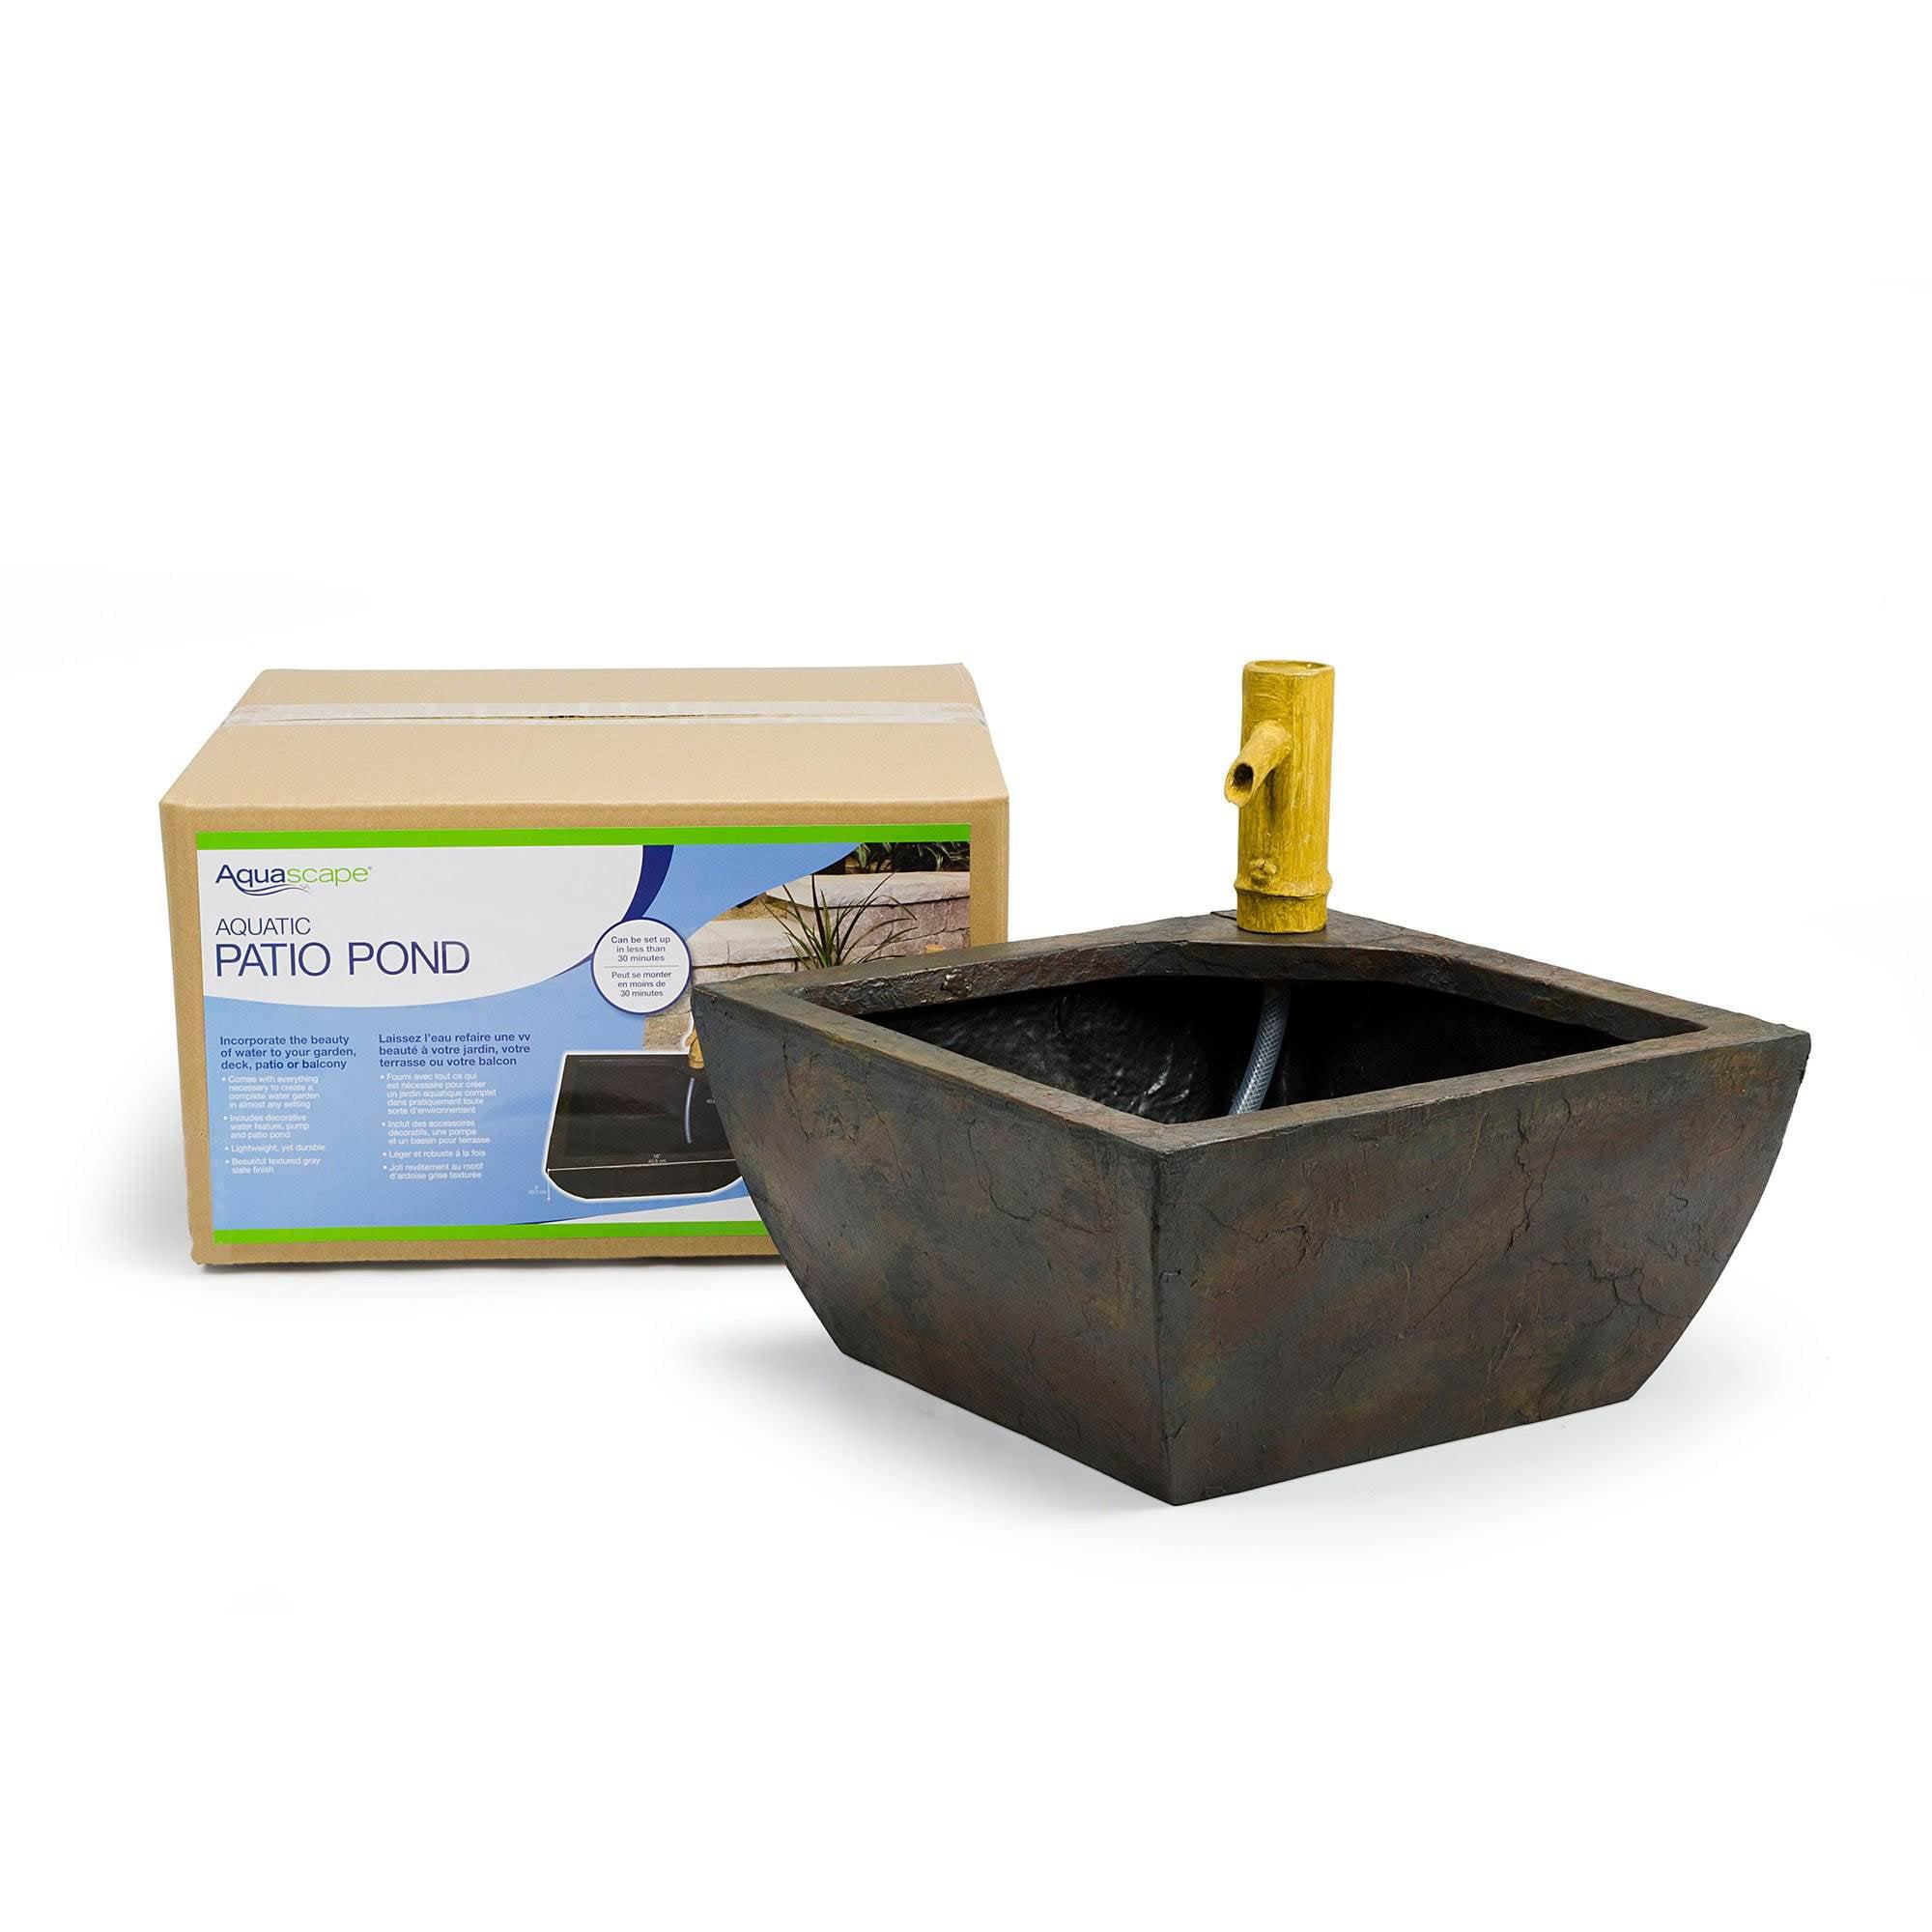 Plante Robuste Pour Terrasse aquascape 16 inch aquatic patio pond water garden planter